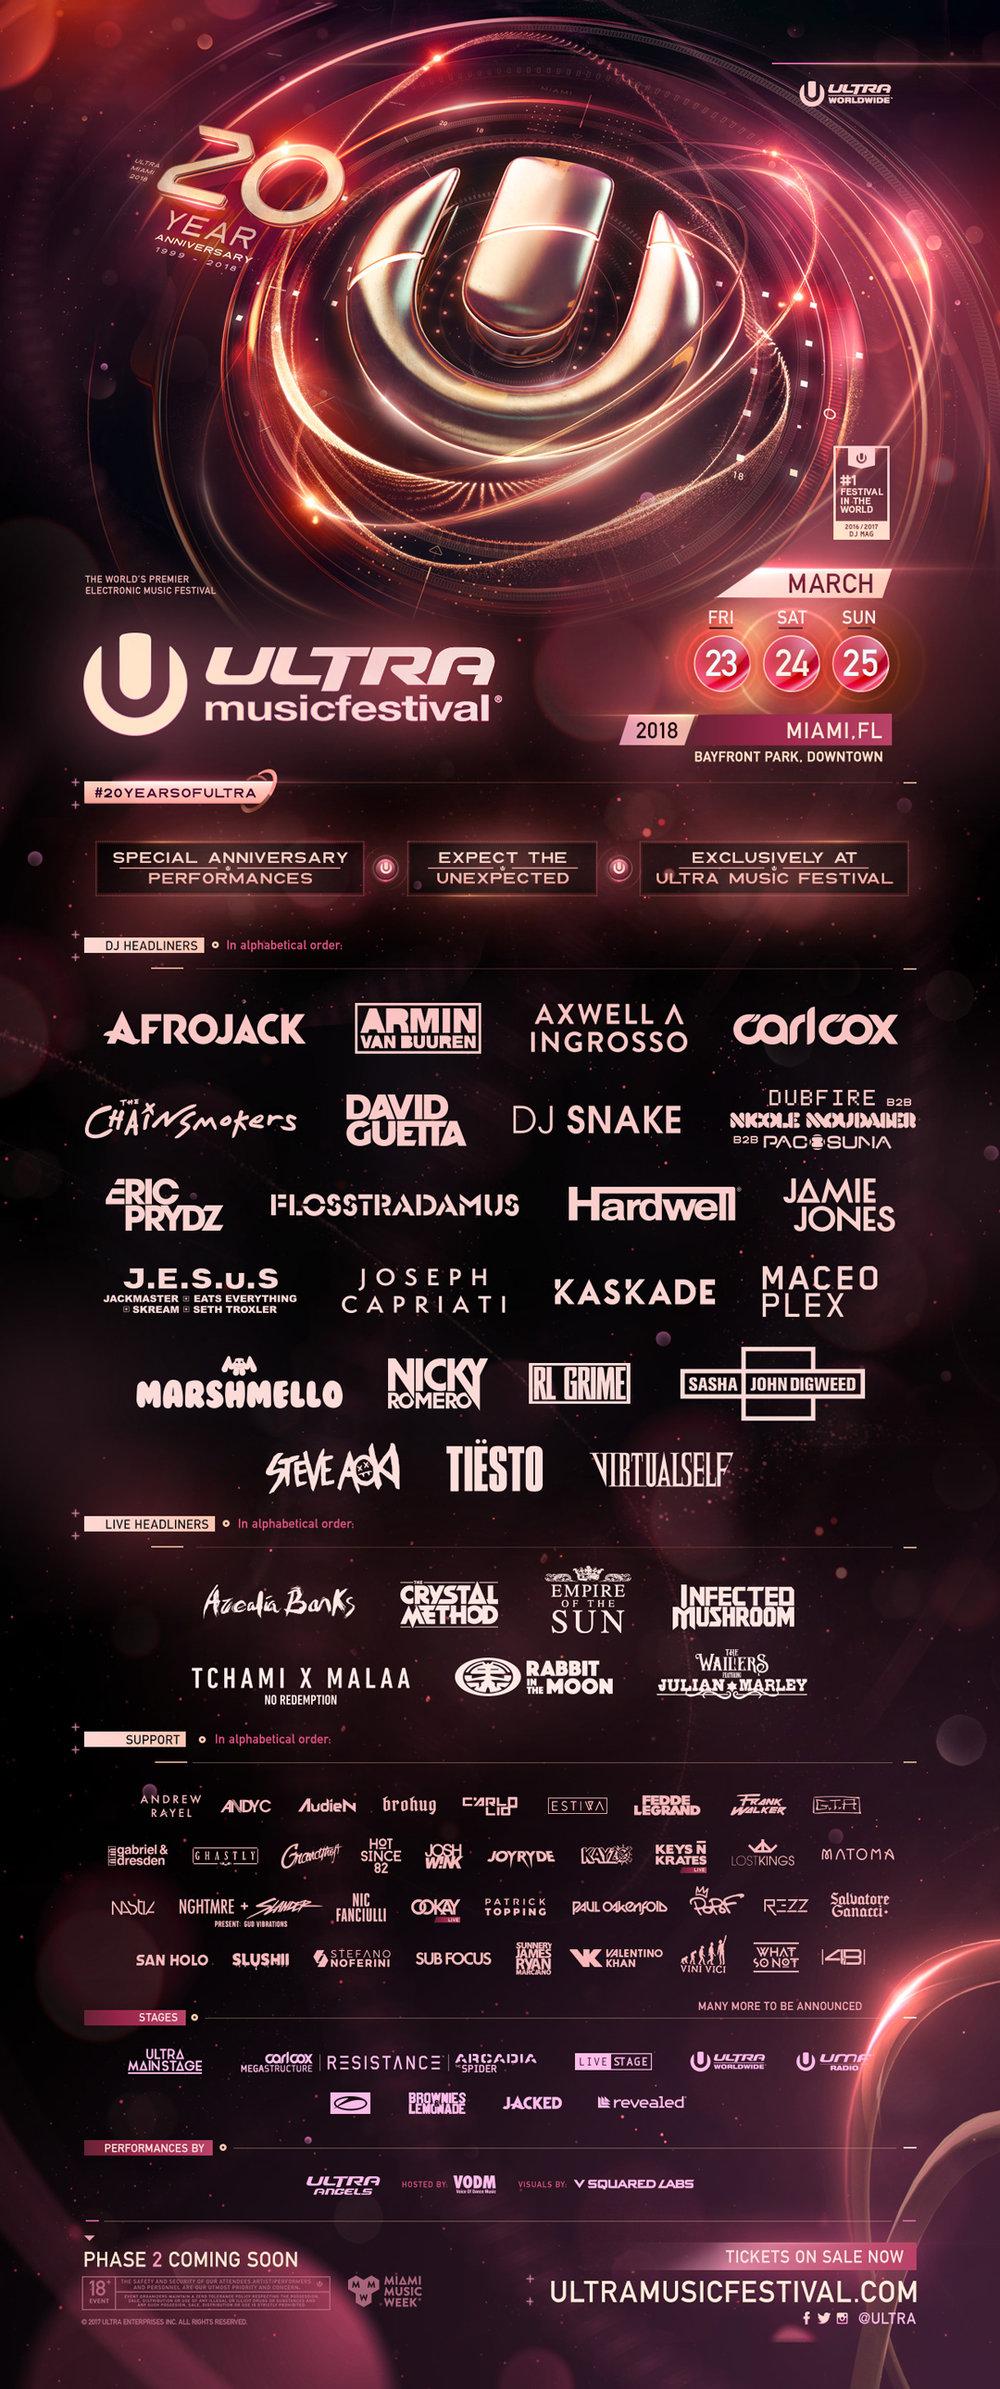 Image via Ultra Music Festival  www.ultramusicfestival.com